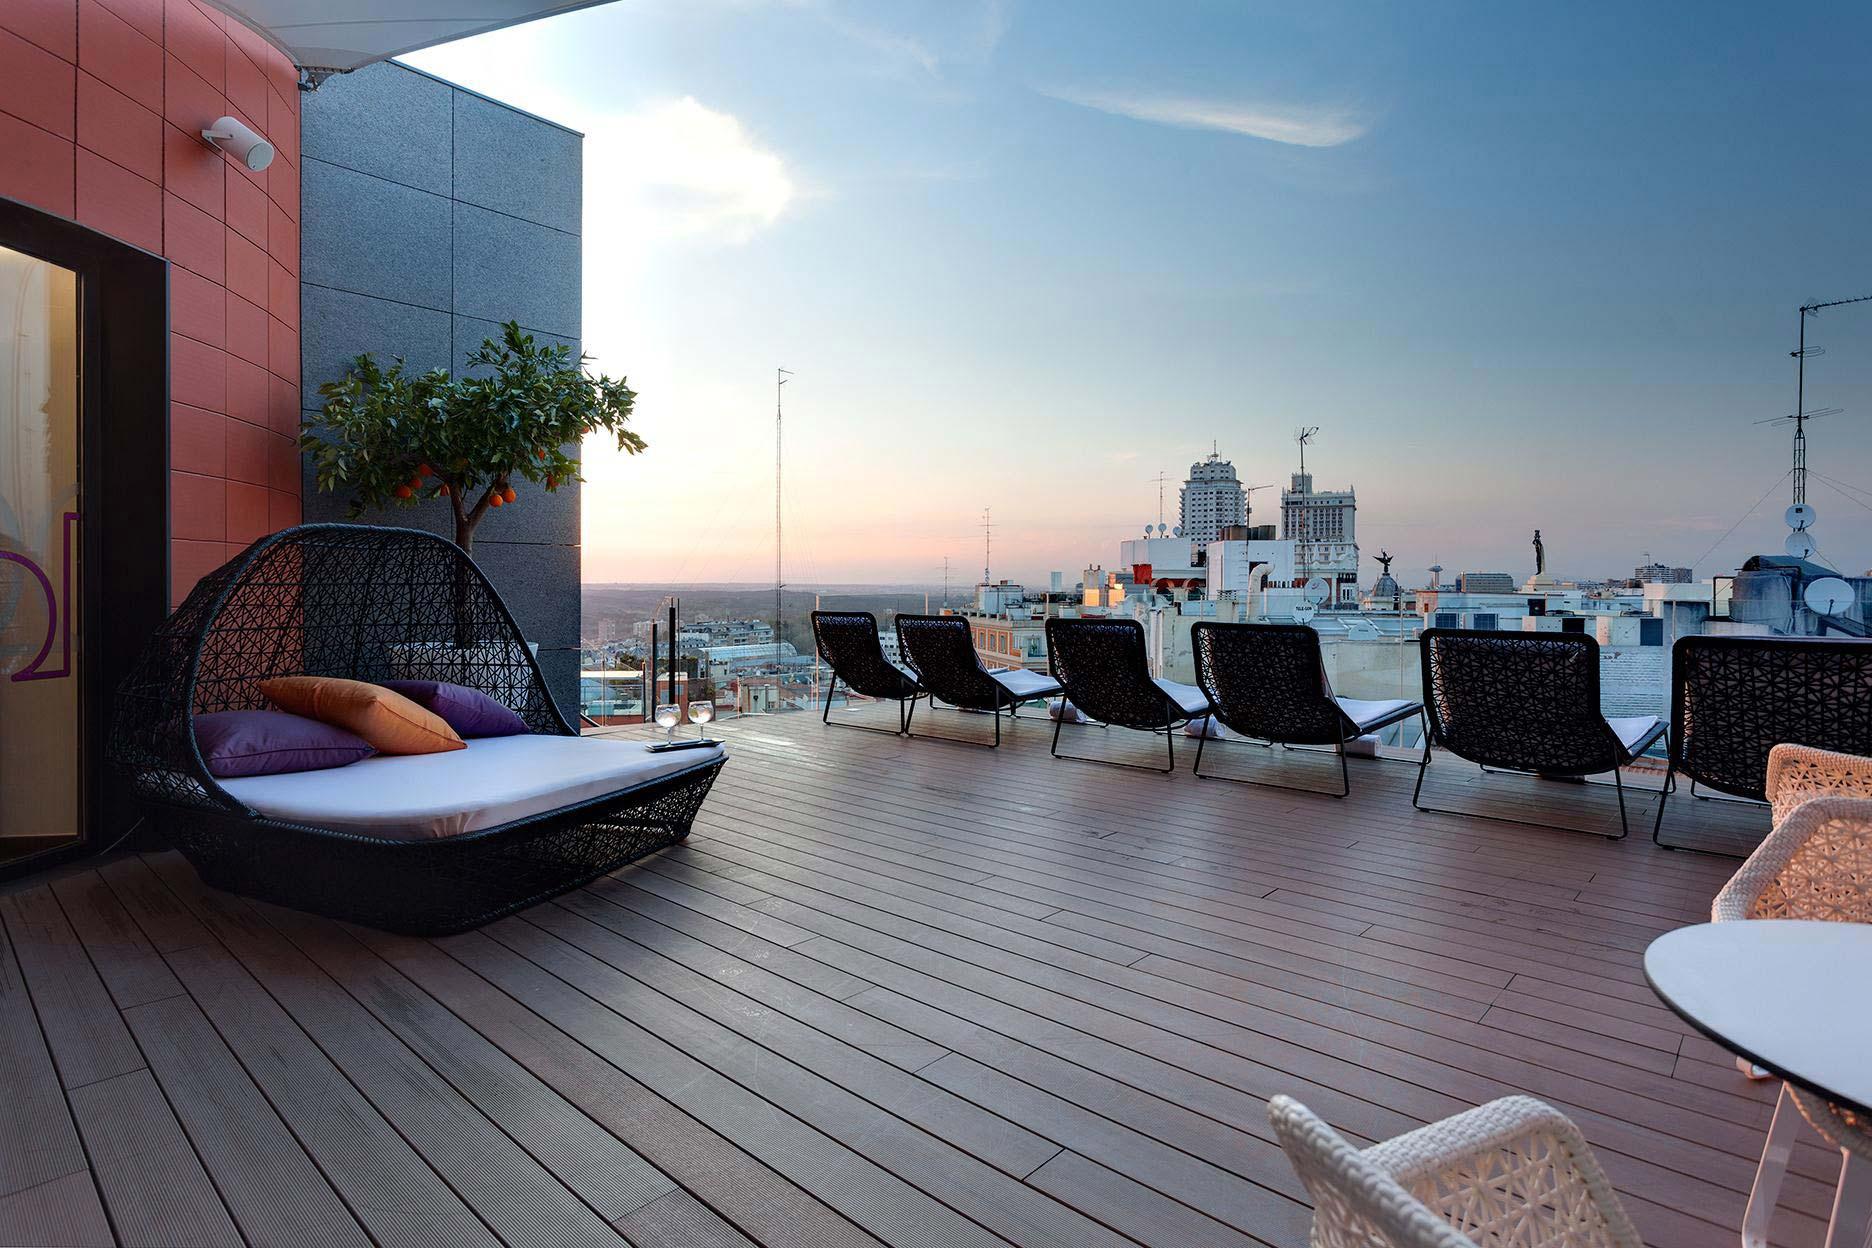 Indigo madrid gomadridpride - Luxury hotels in madrid with swimming pool ...